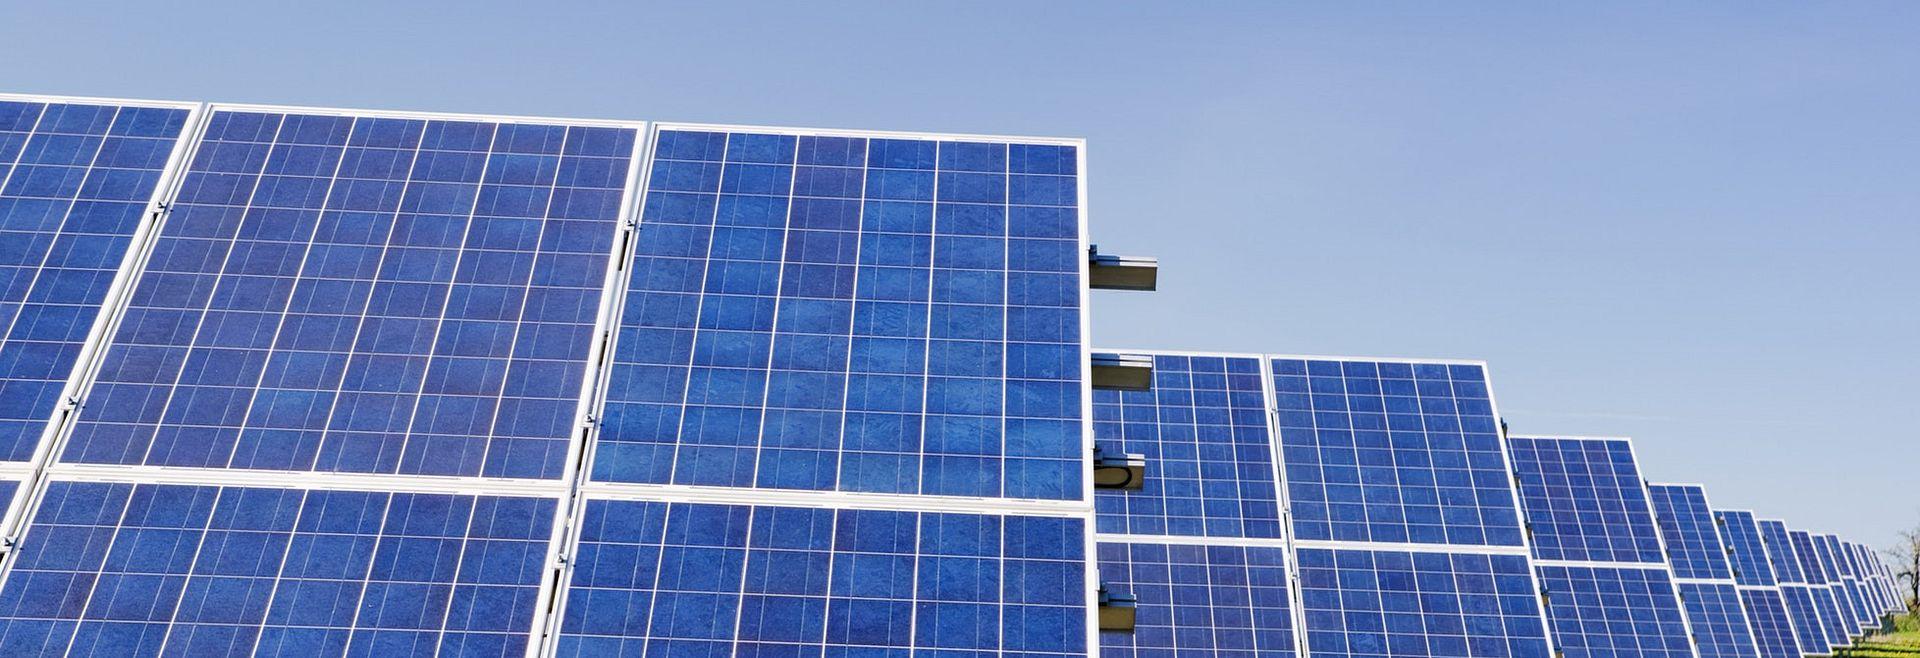 Solar panel farm in field of grass